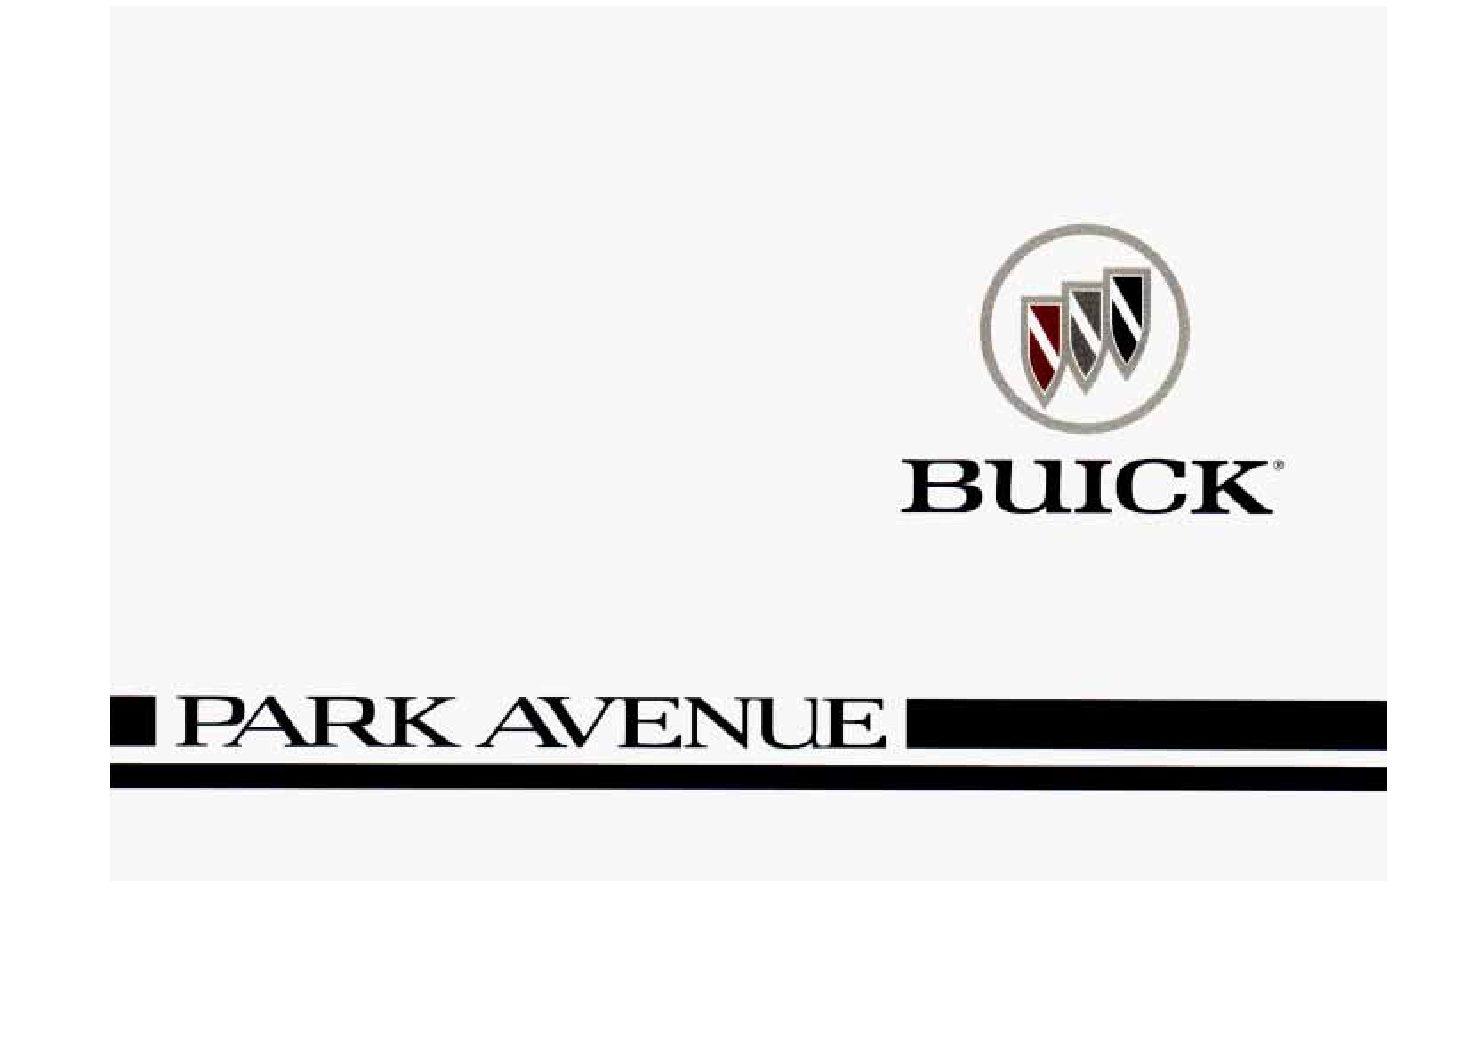 1996 buick park